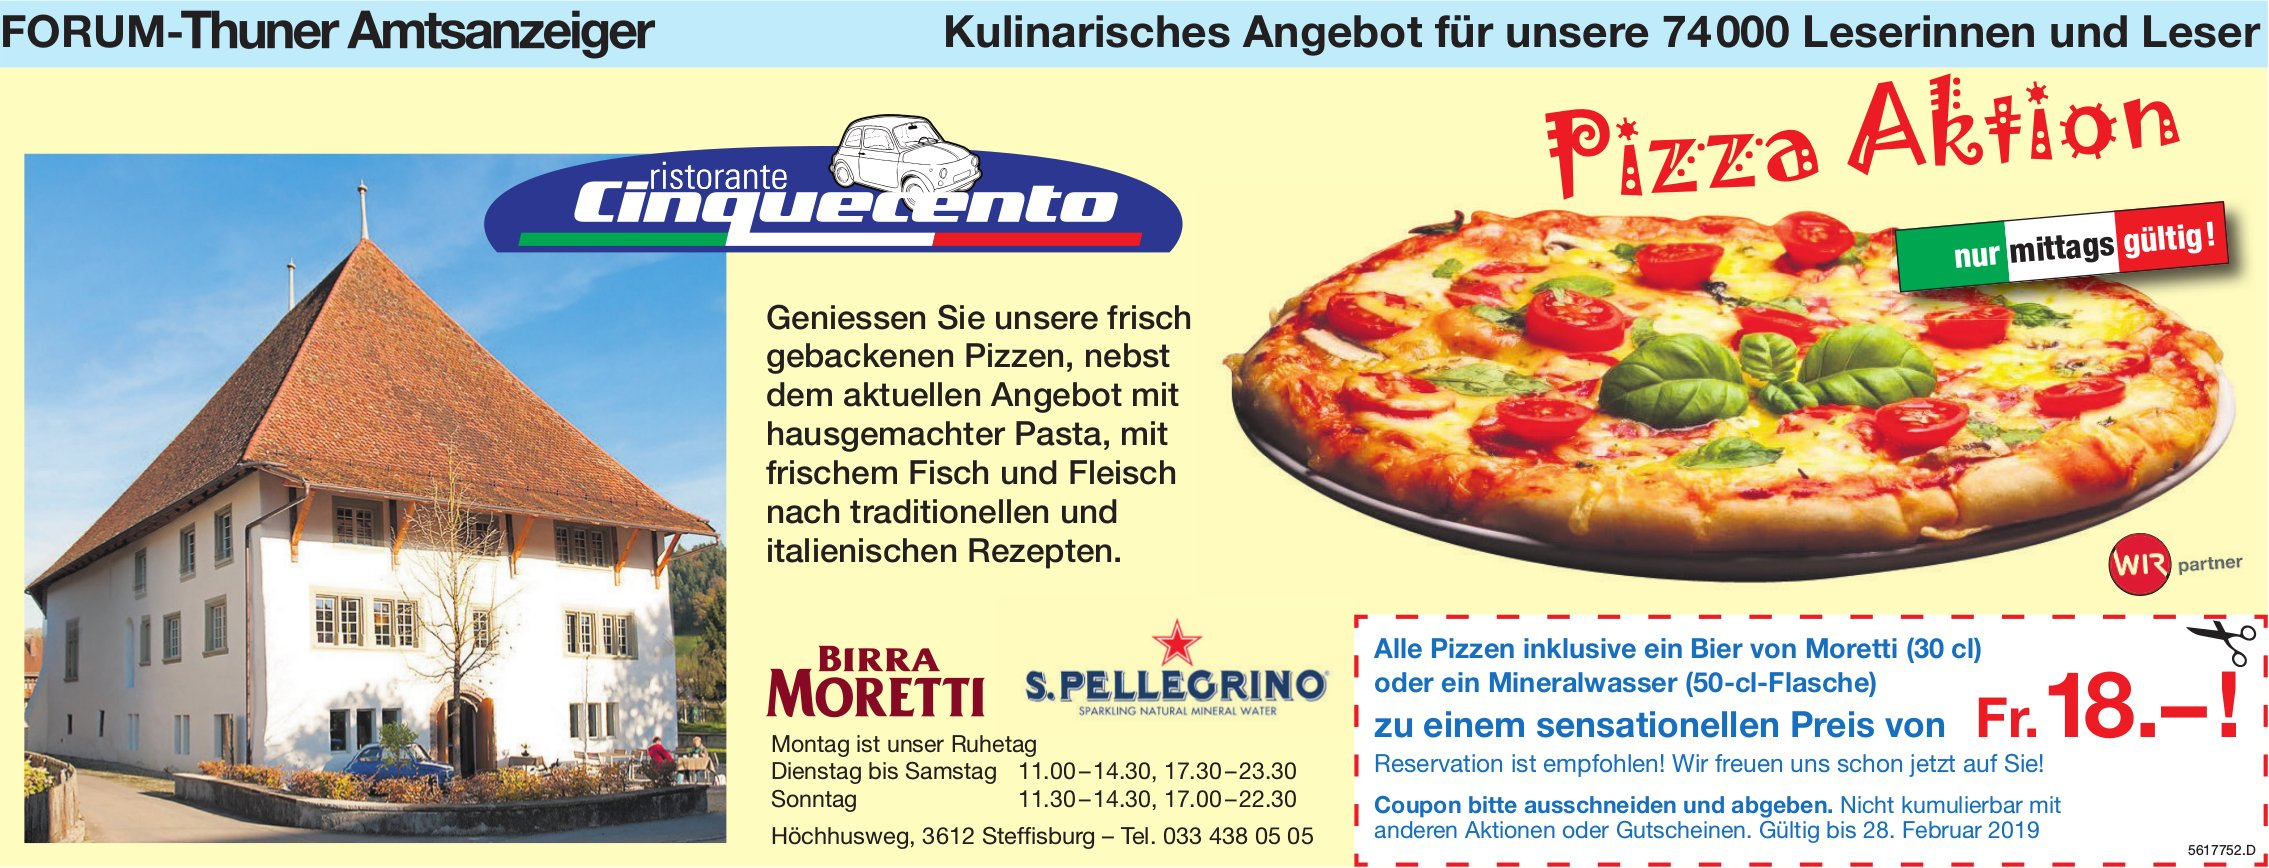 Forum-Thuner Amtsanzeiger - Ristorante Cinquecento: Pizza Aktion bis 28. Februar